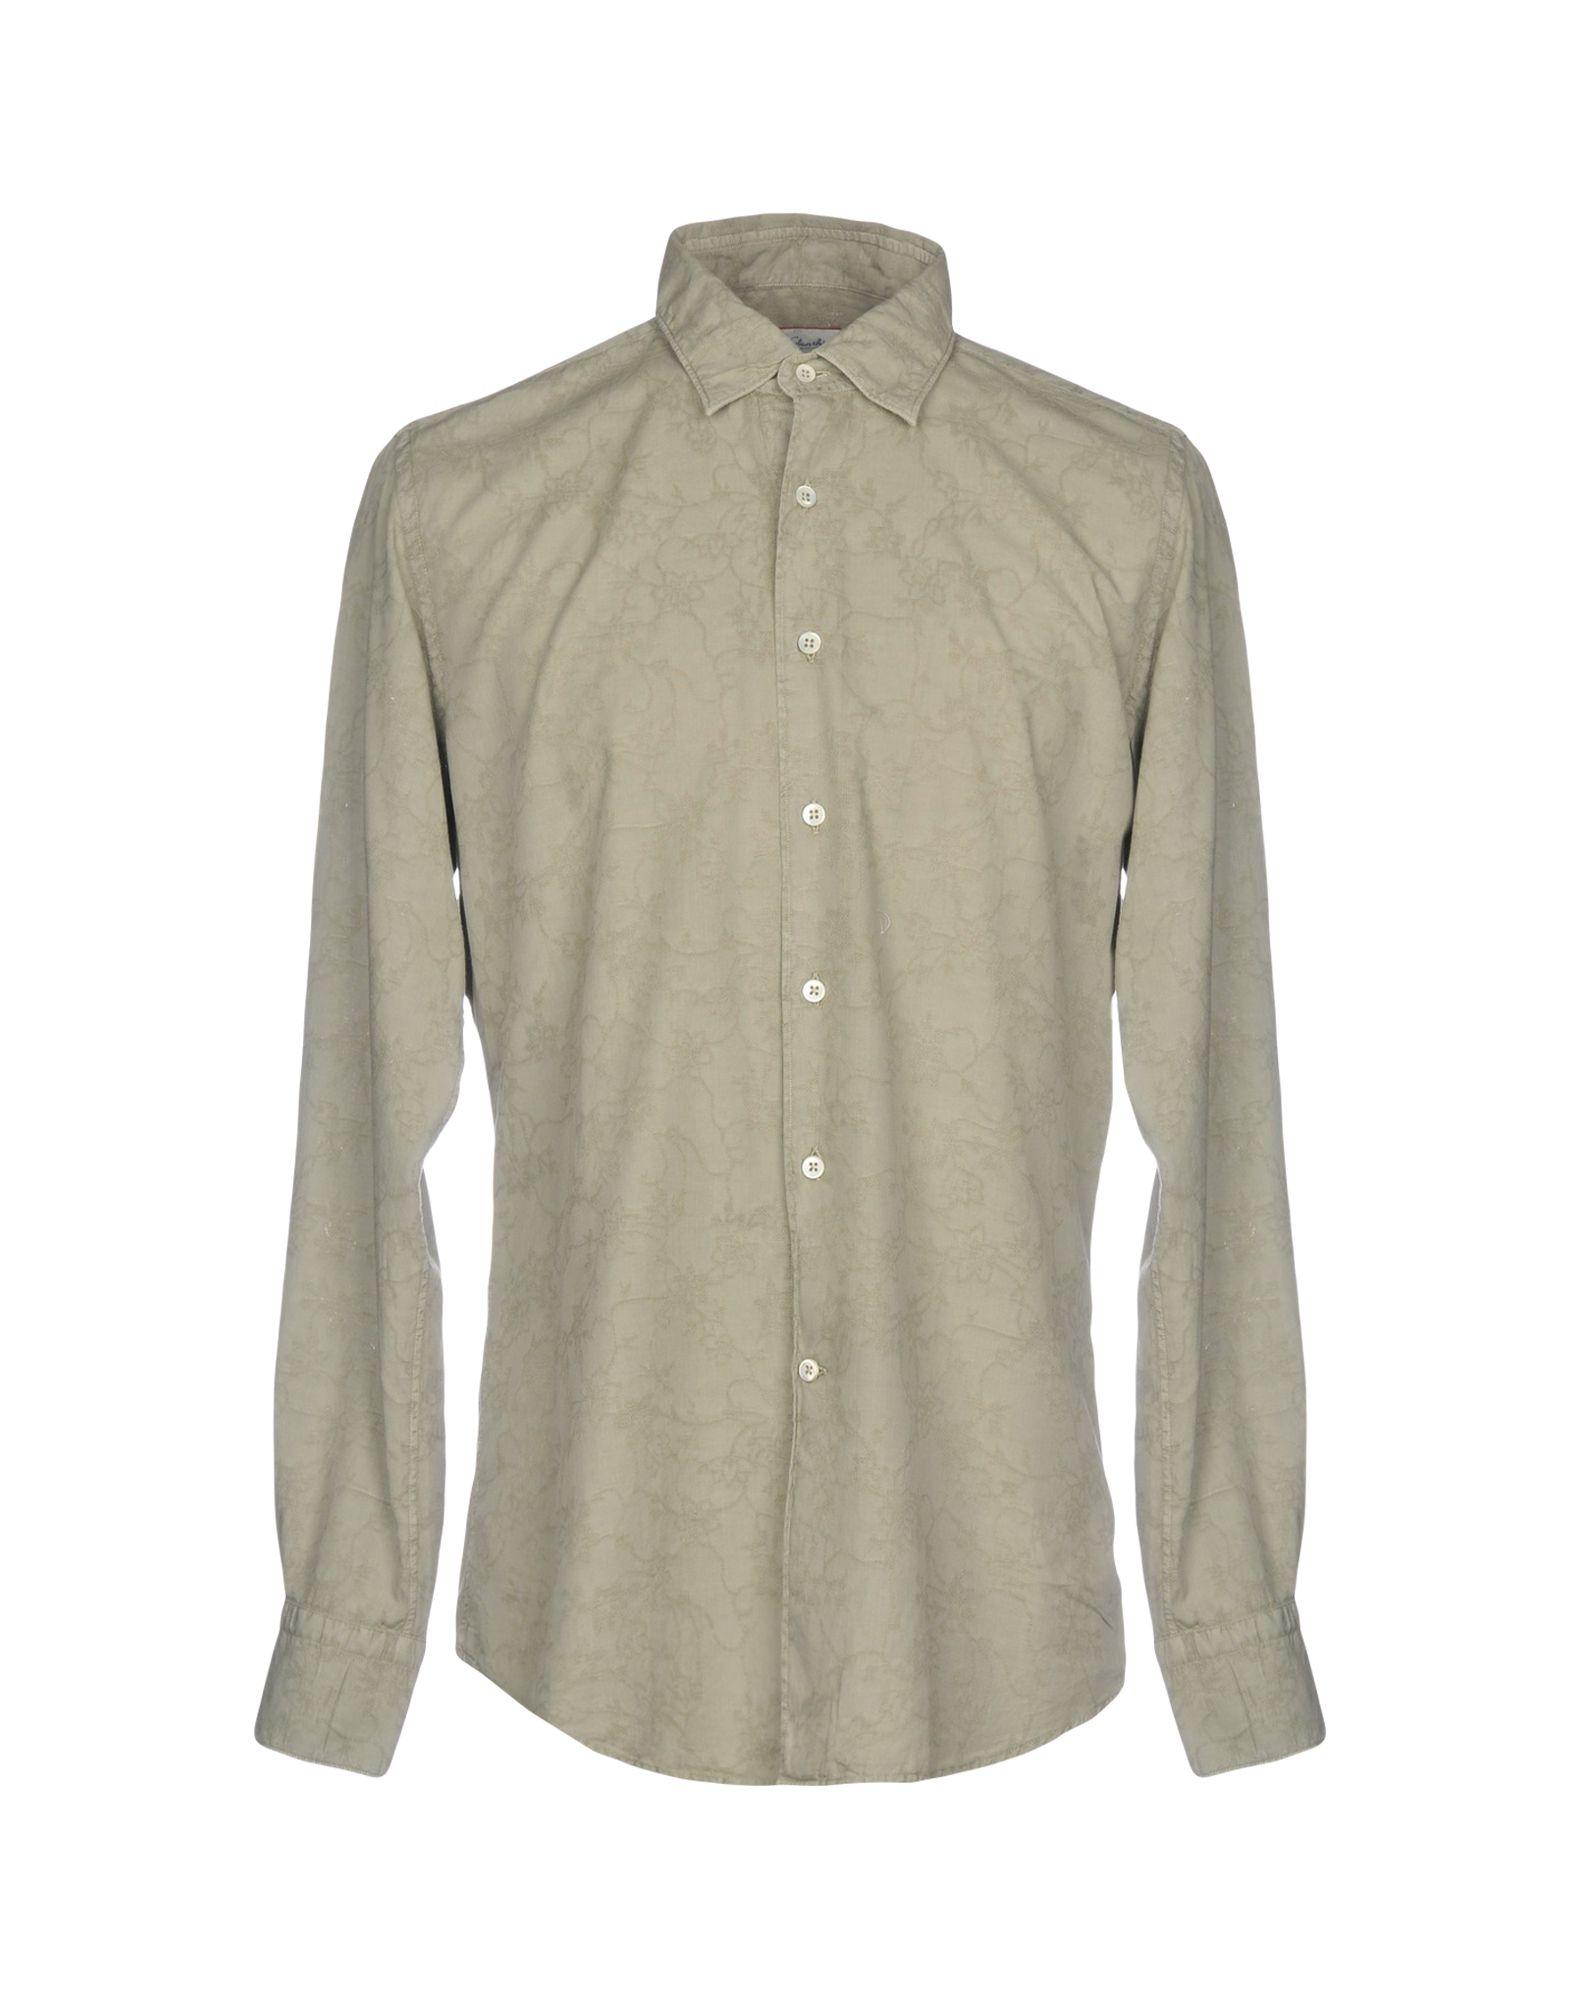 GLANSHIRT Solid Color Shirt in Grey